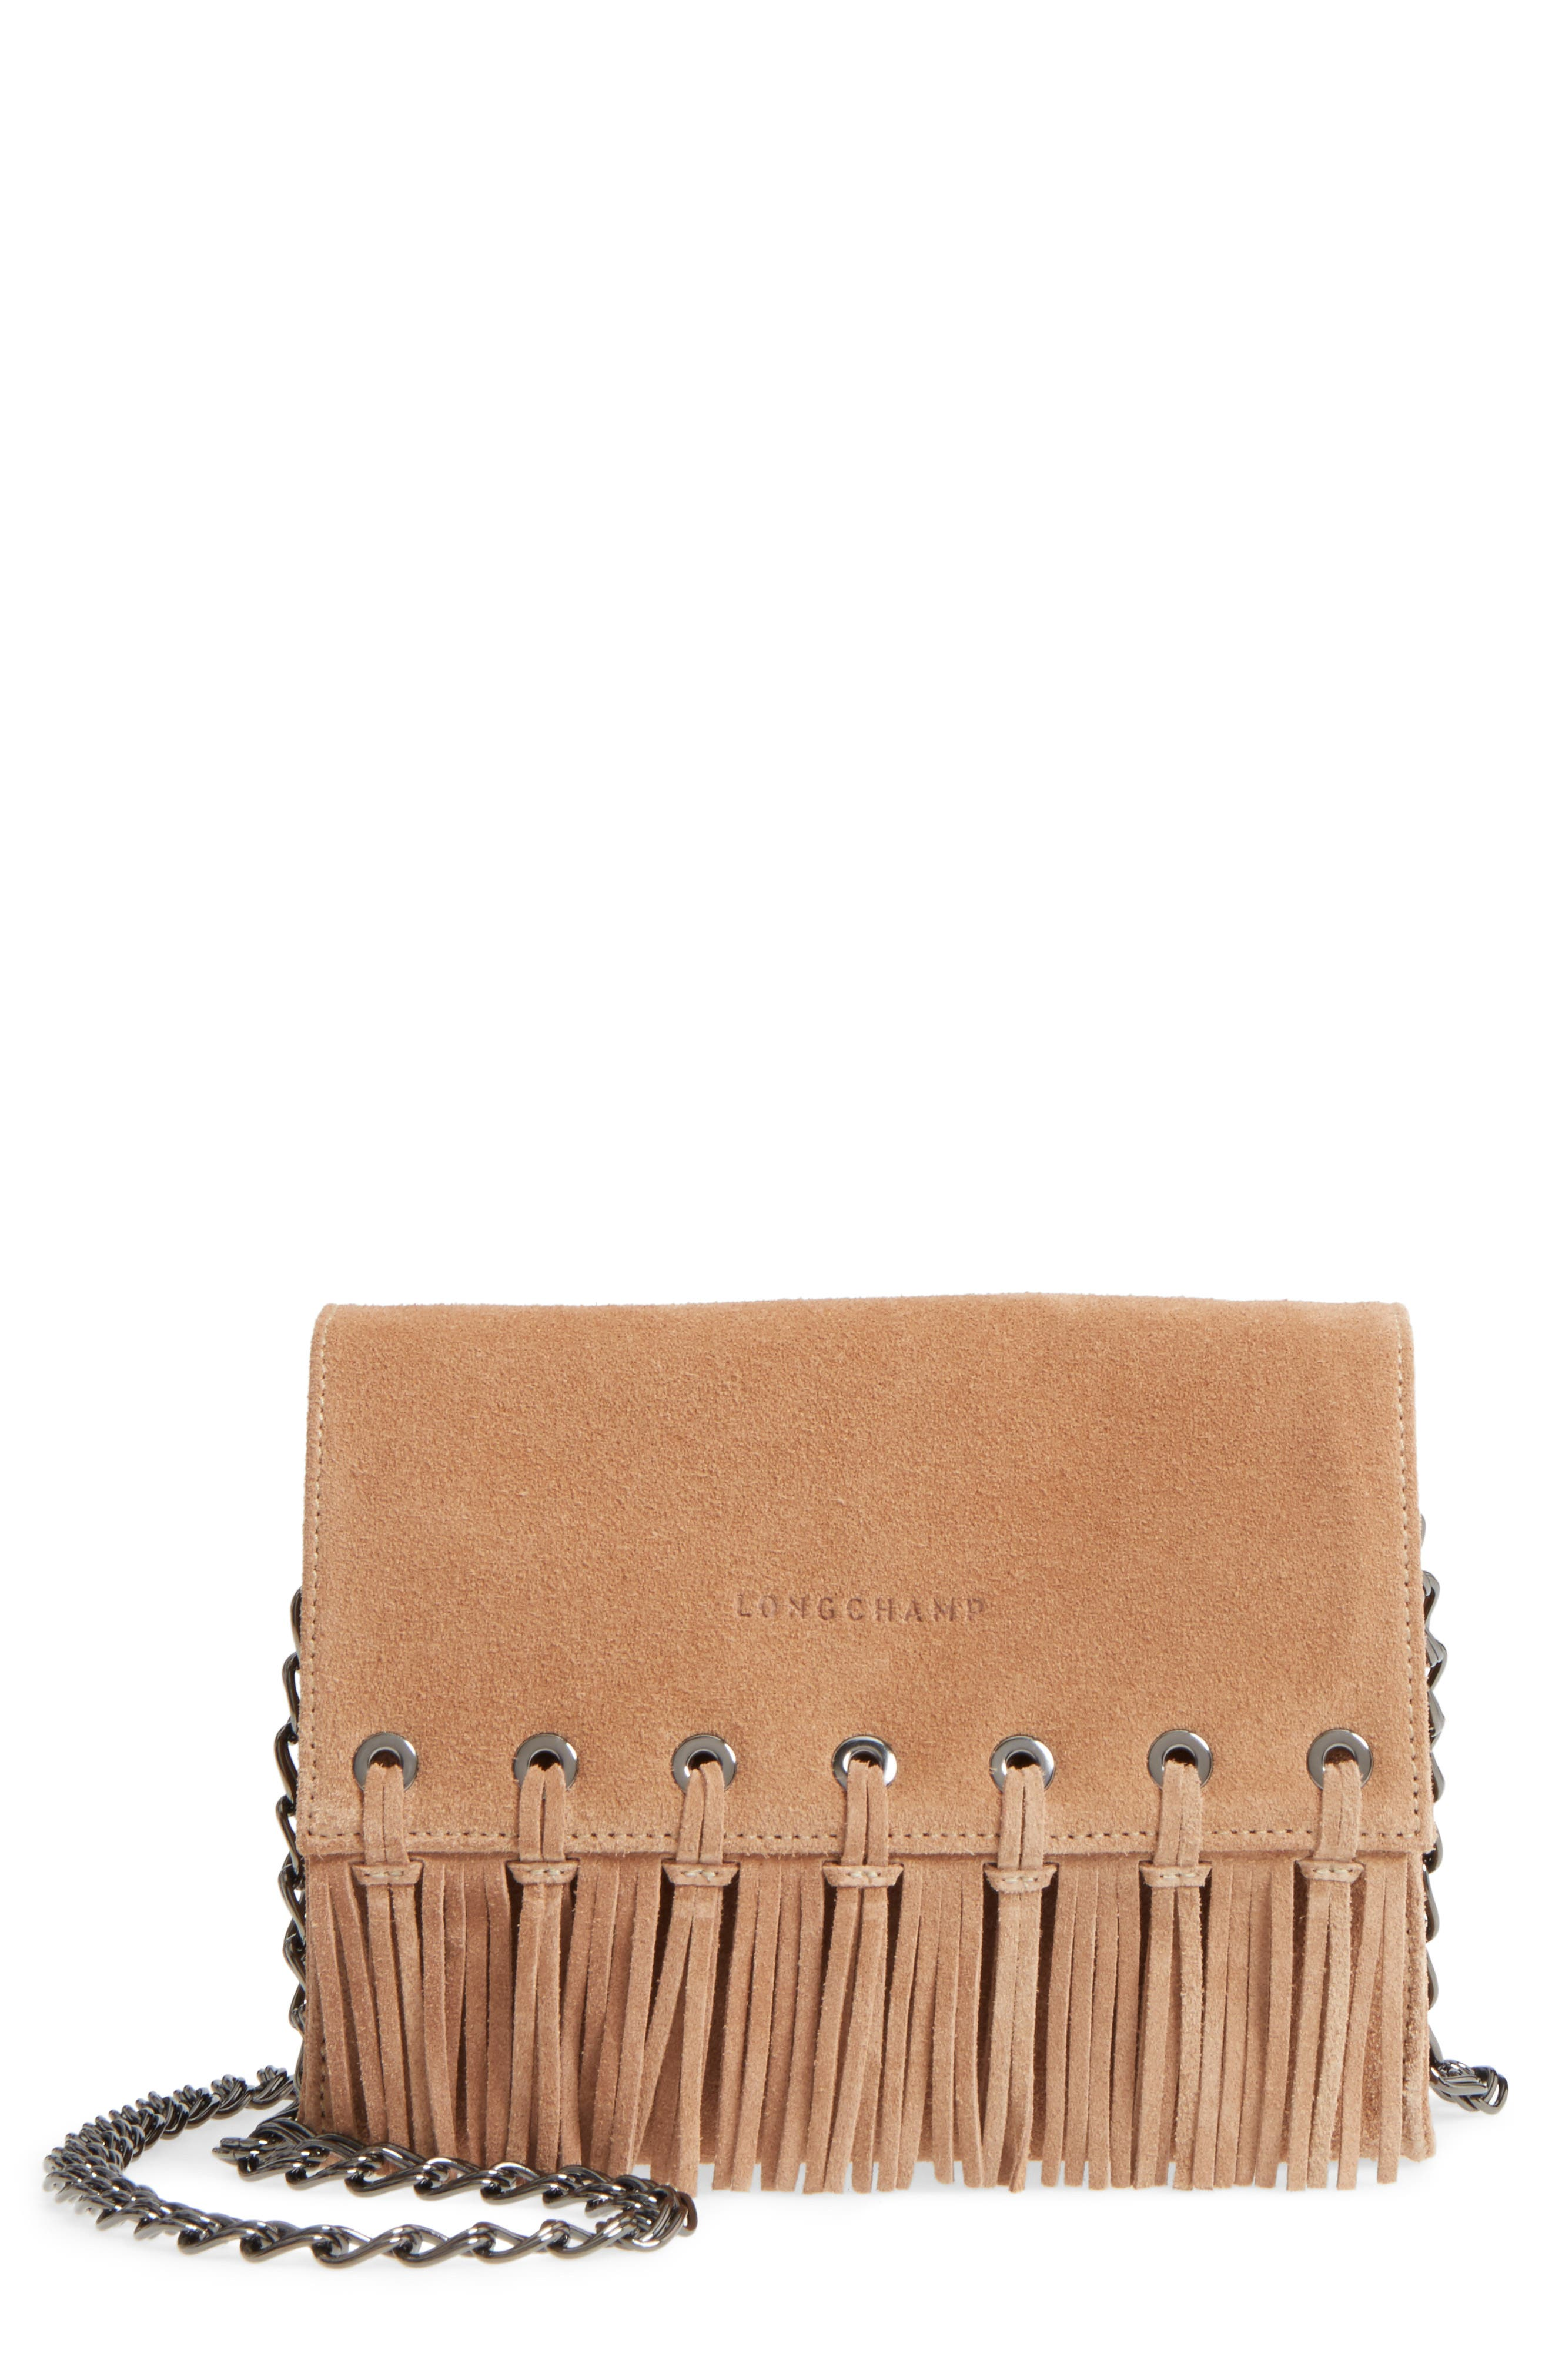 Main Image - Longchamp Paris Rocks Fringe Calfskin Suede Crossbody Bag